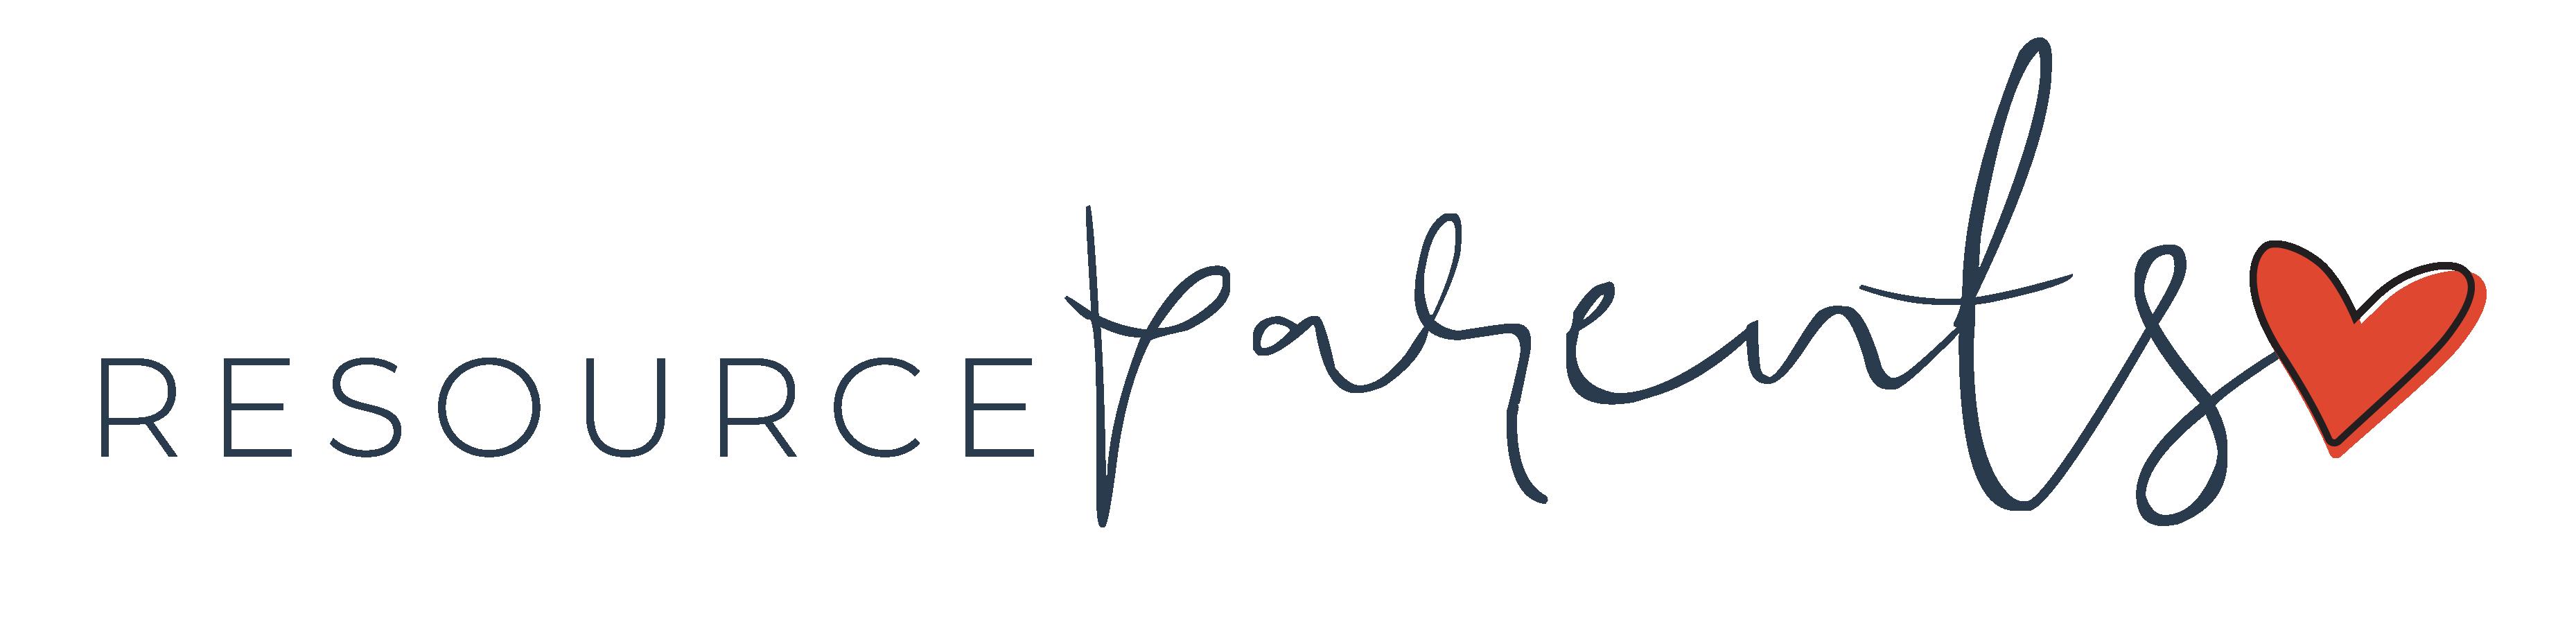 Resource-Parents-Foster-Care logo